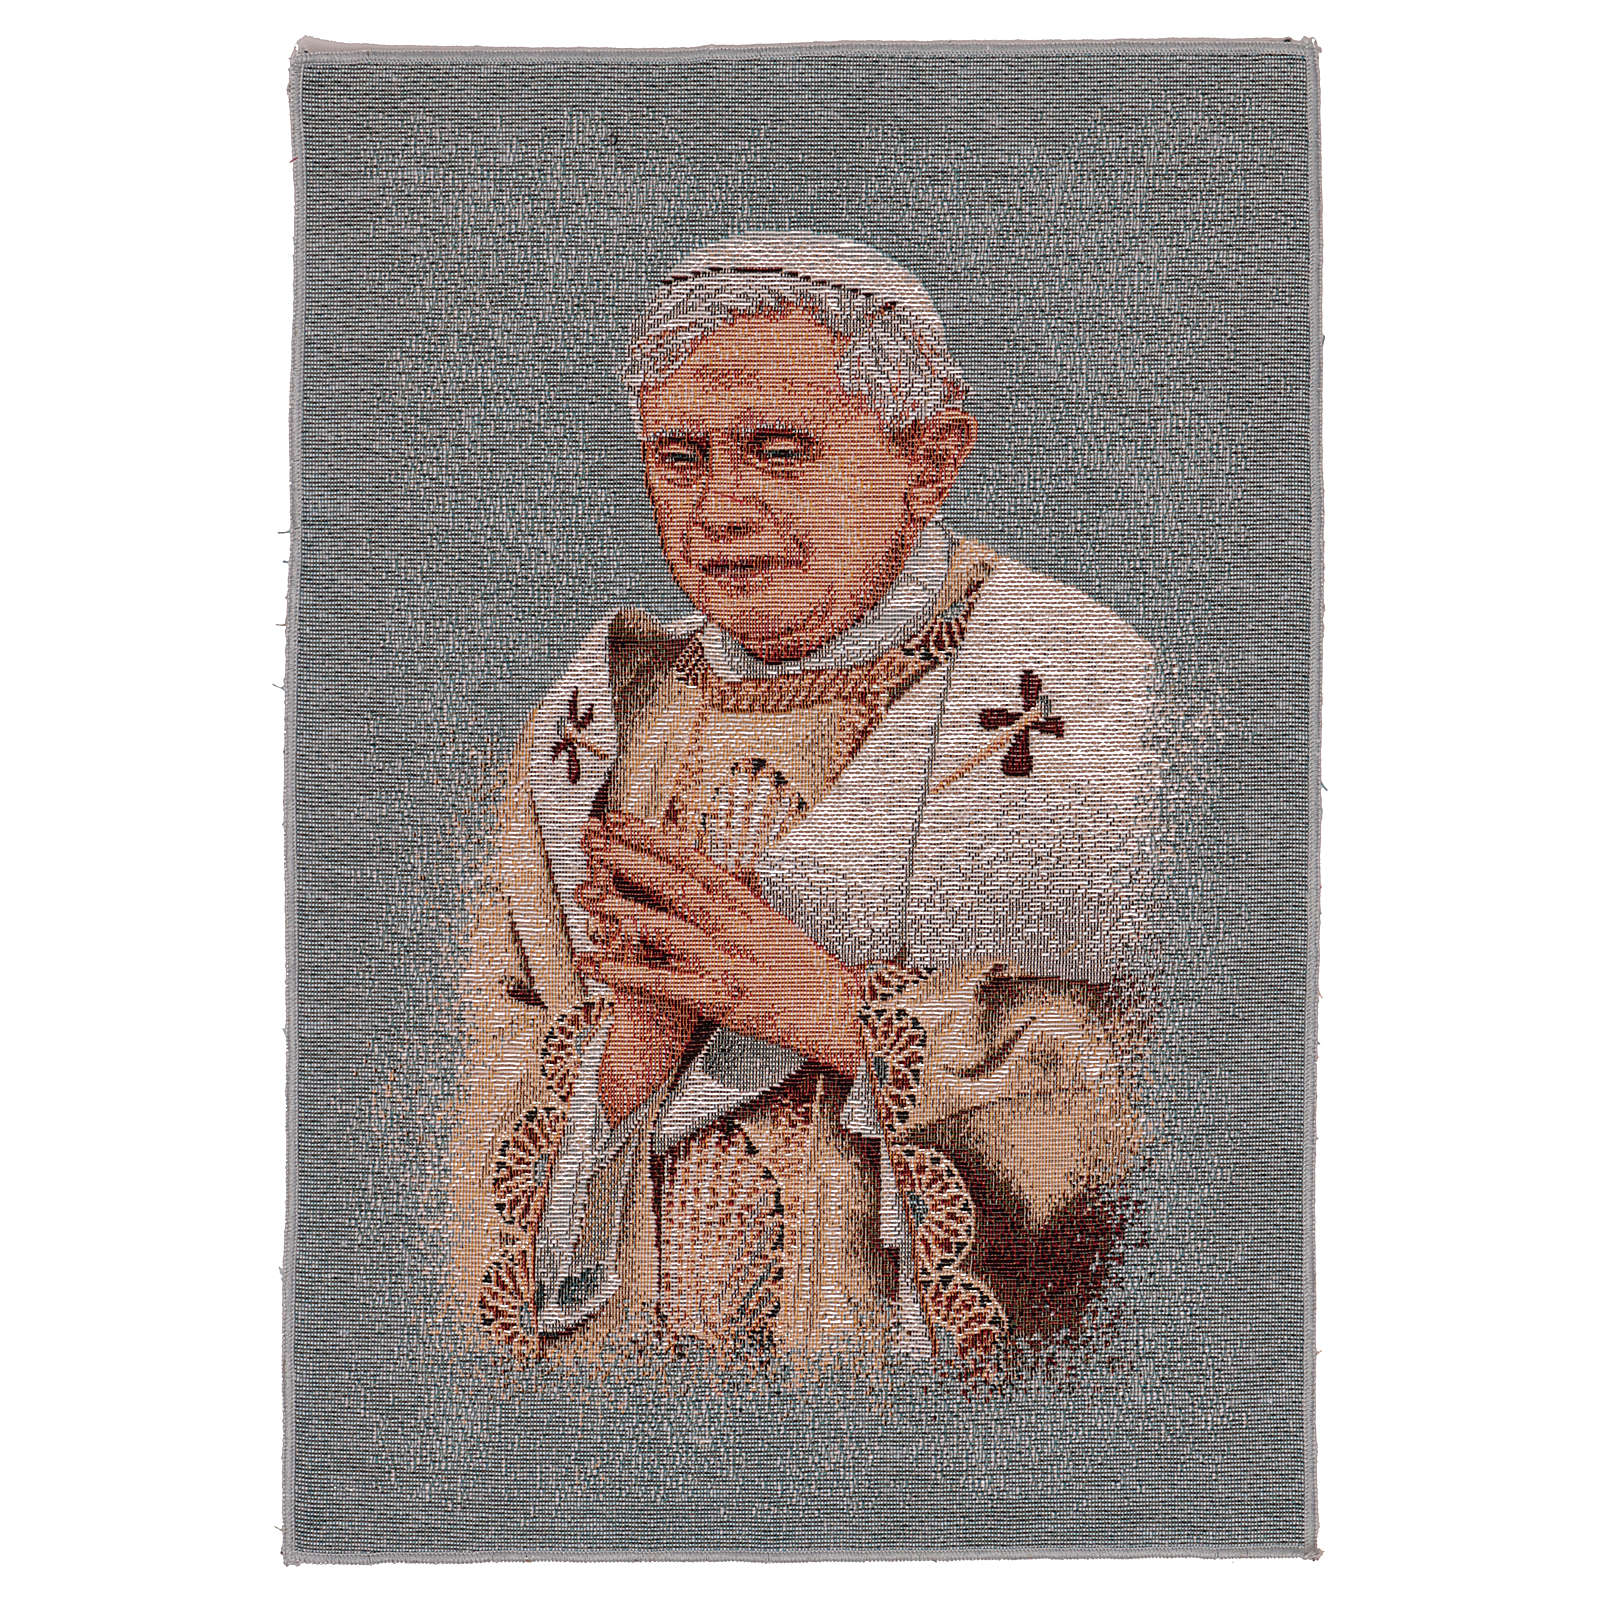 Pope Benedict XVI with light blue background 17x11.5